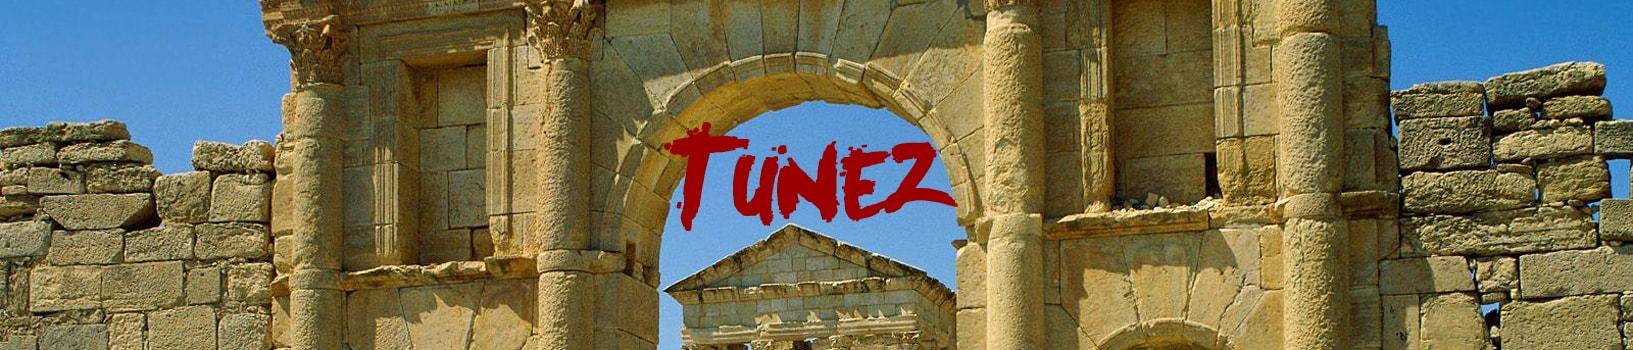 viaje-tunez